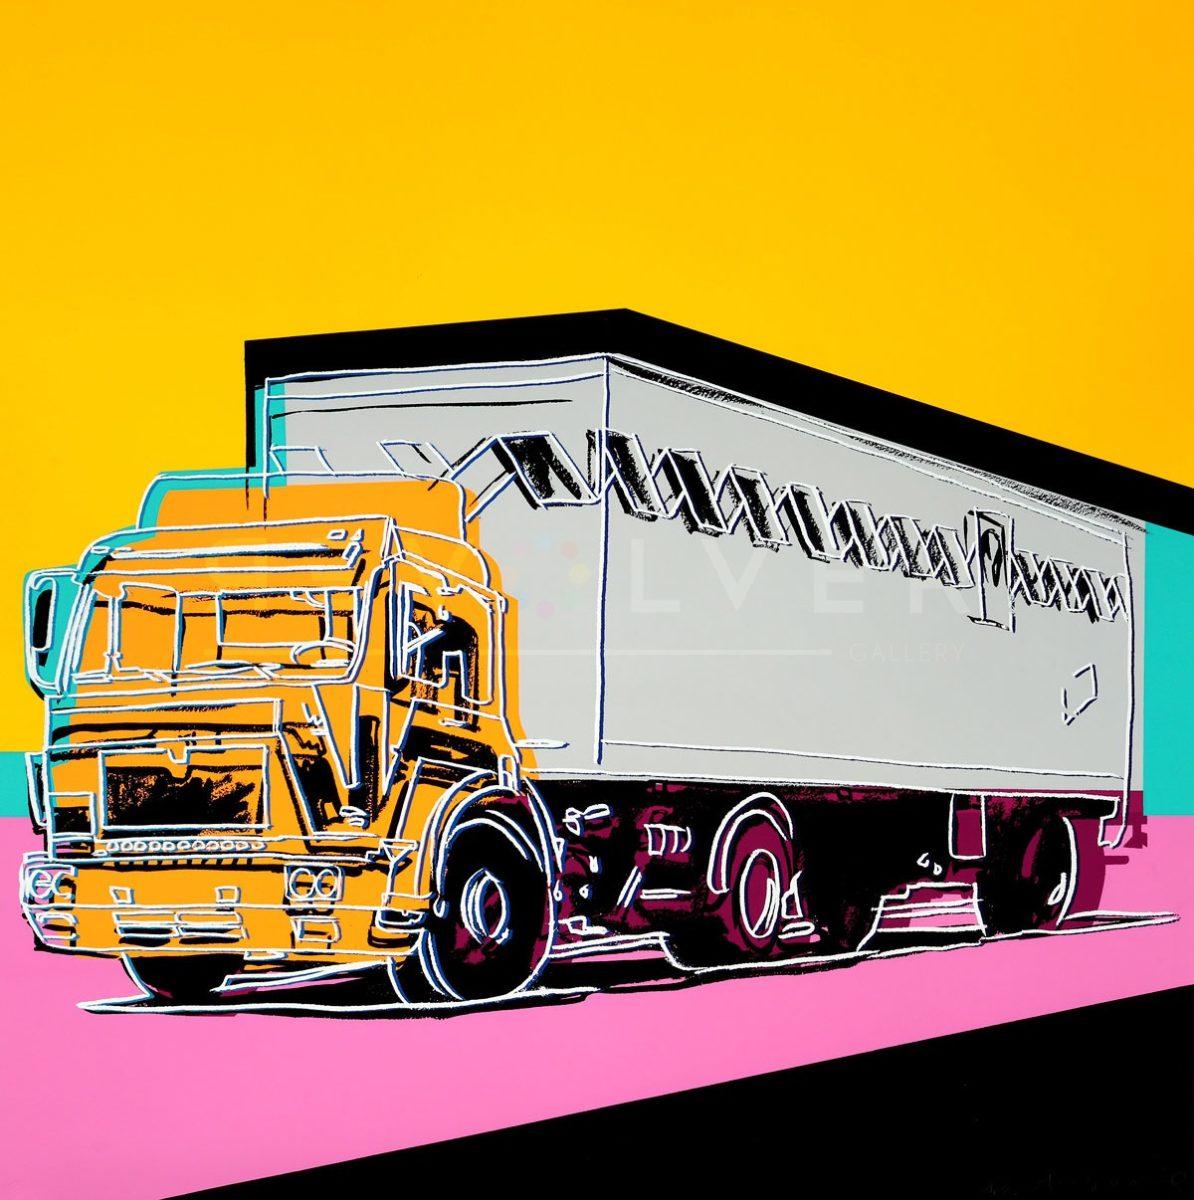 Andy Warhol's screenprint Truck 367